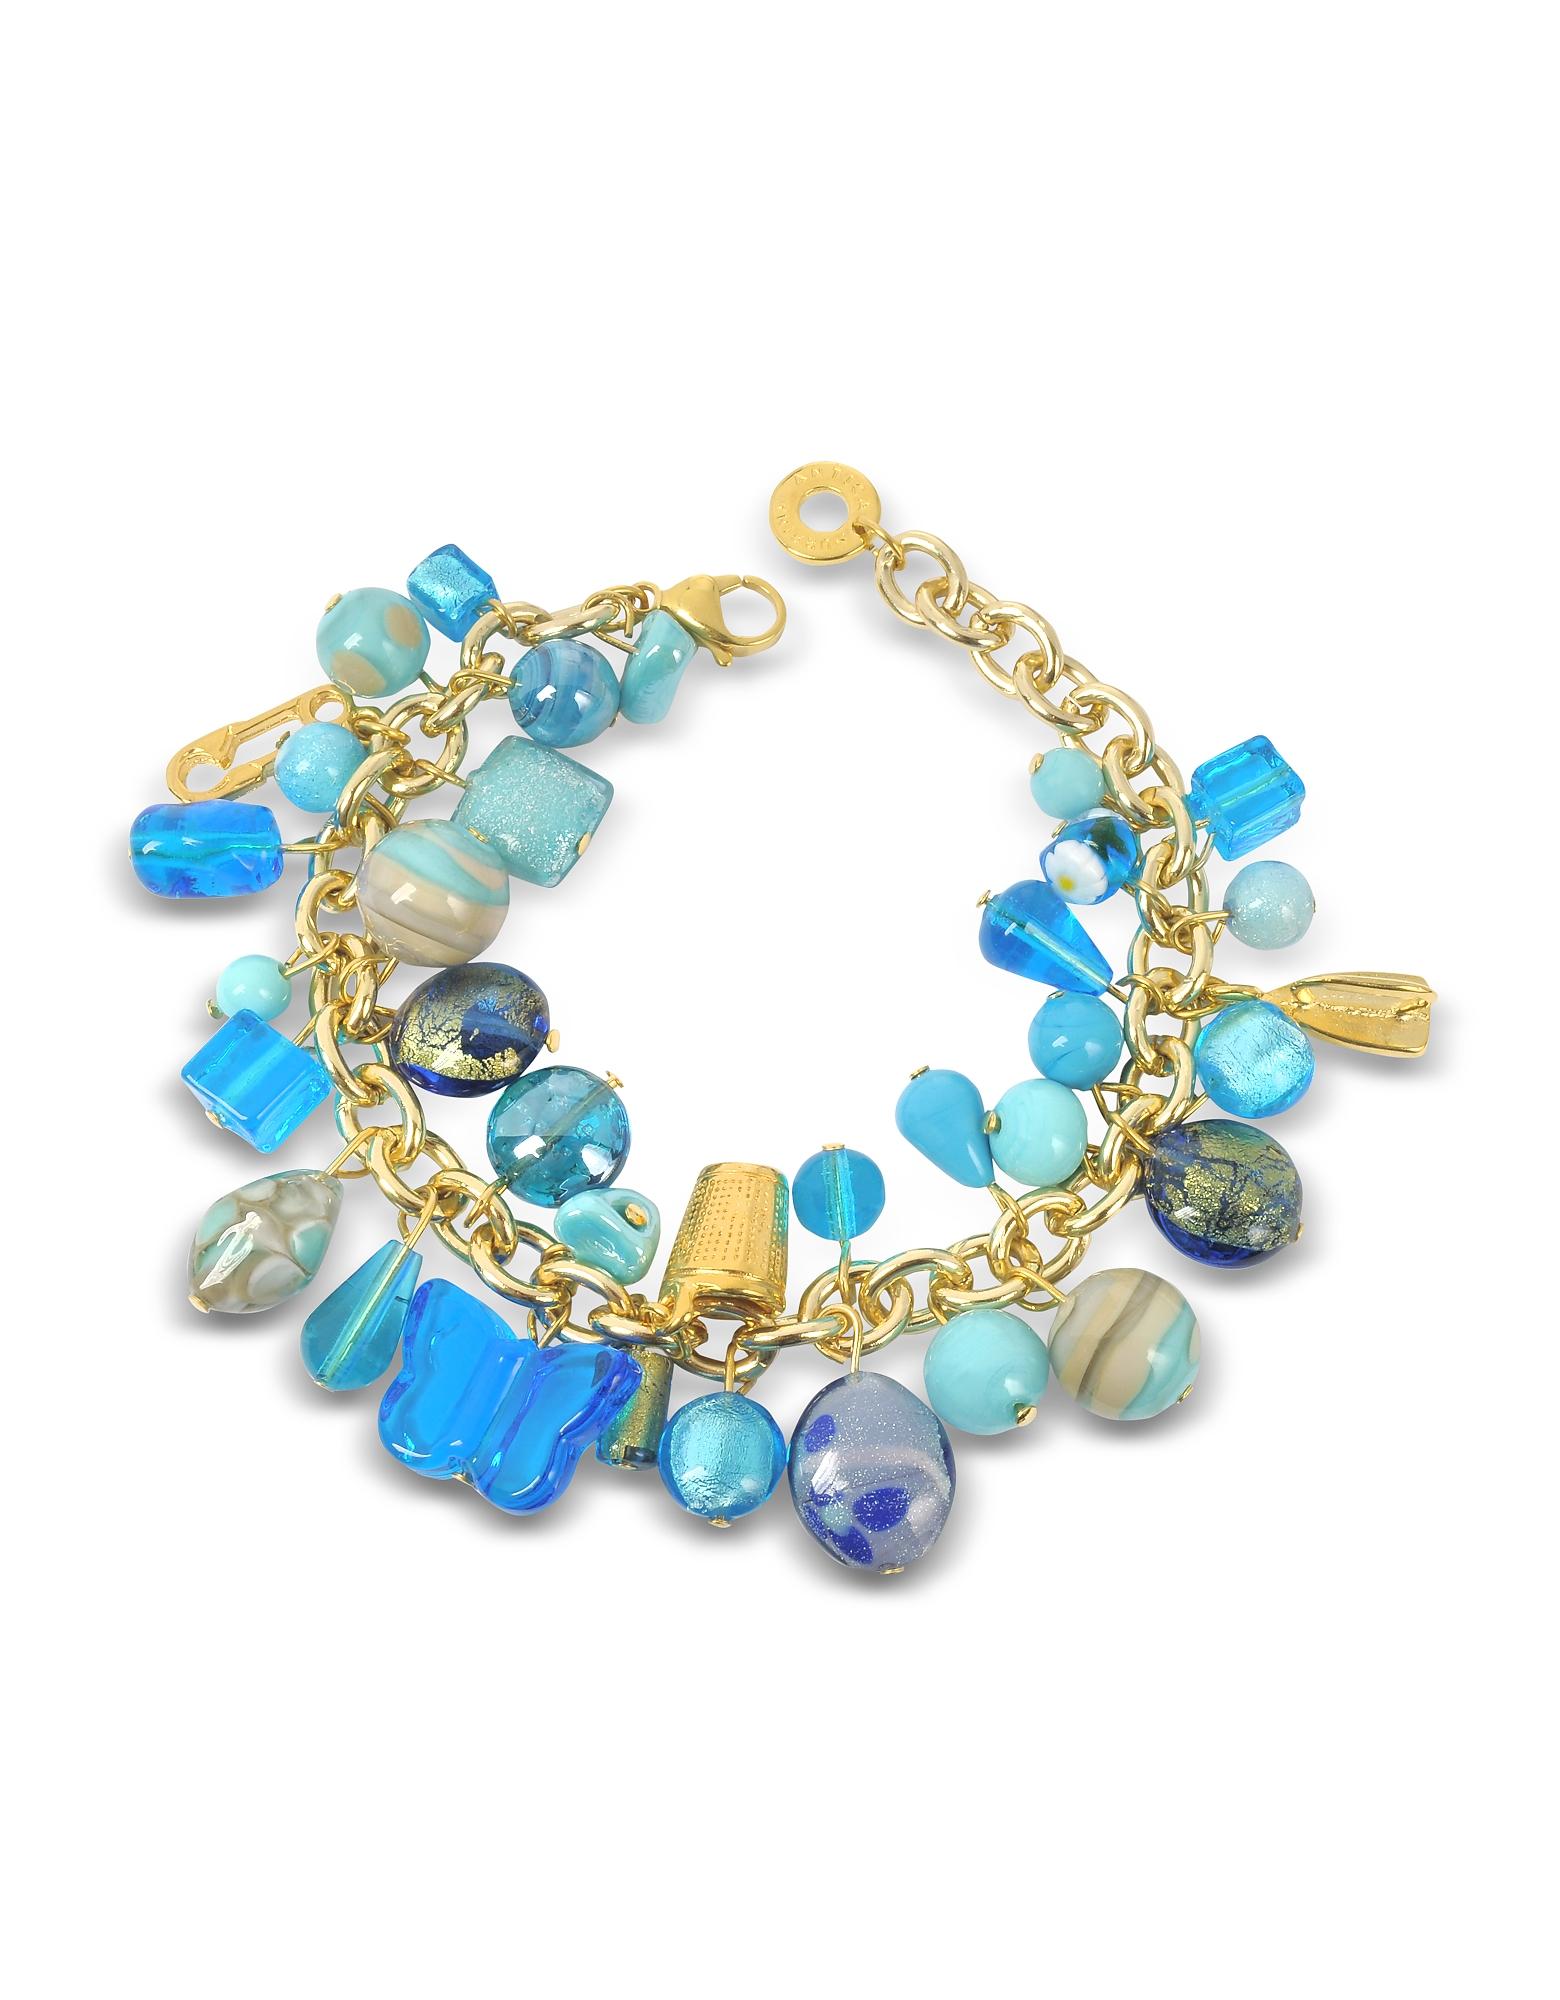 Image of Antica Murrina Designer Bracelets, Marilena Murano Glass Marine Charms Bracelet